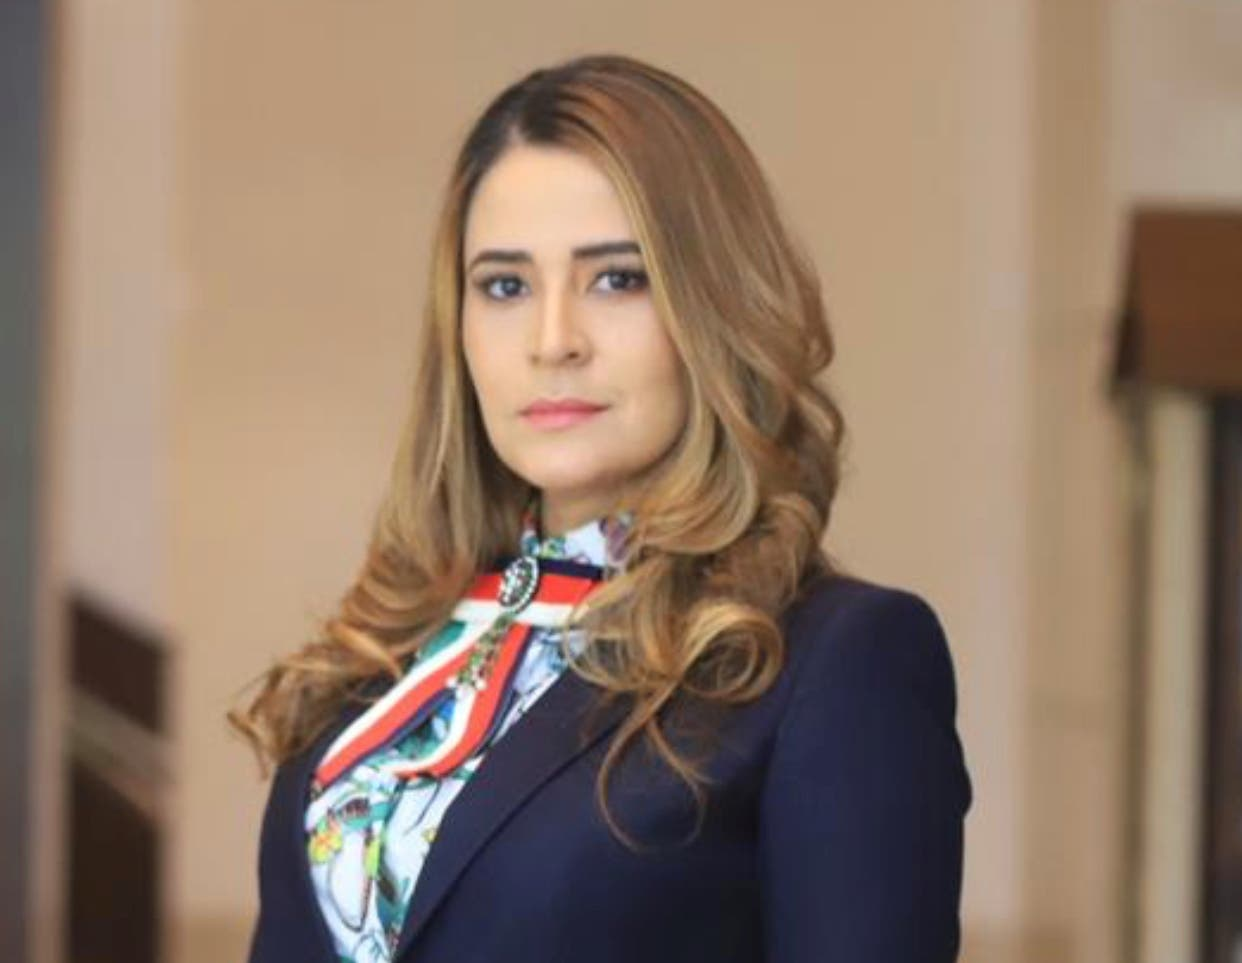 Entidades de la sociedad civil postulan a catedrática Lenis García a JCE